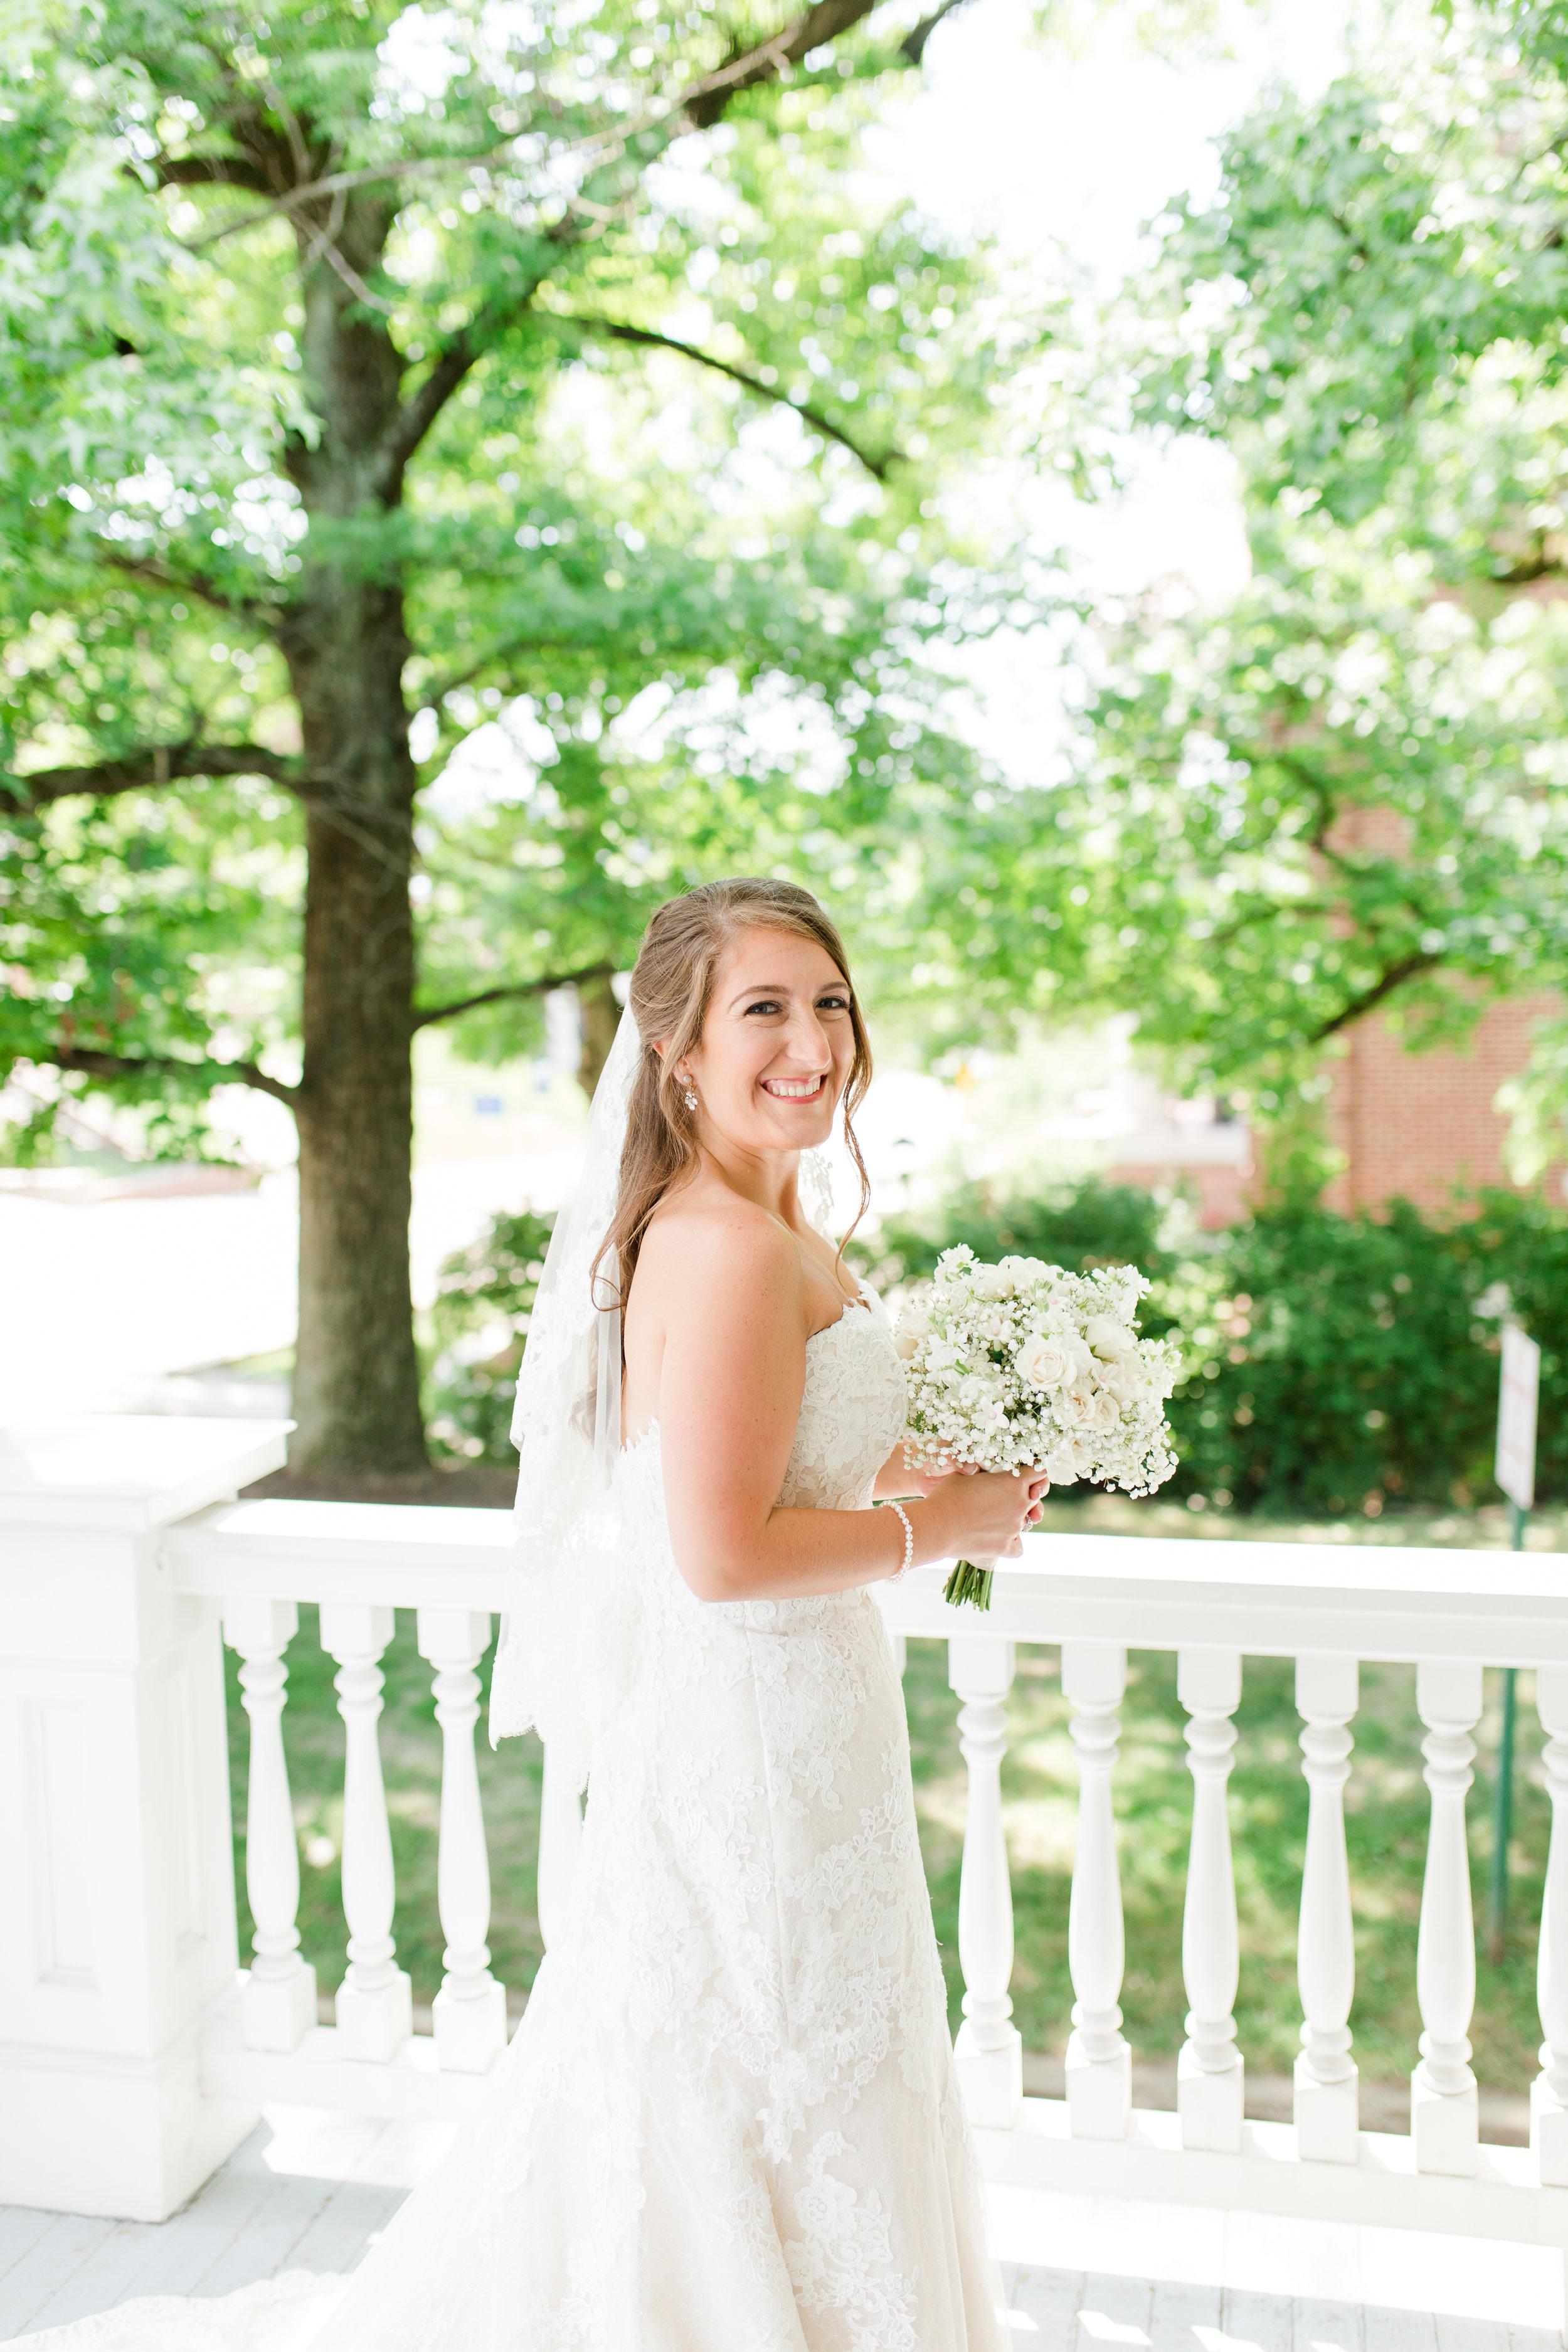 bridals and bridal party-19.jpg